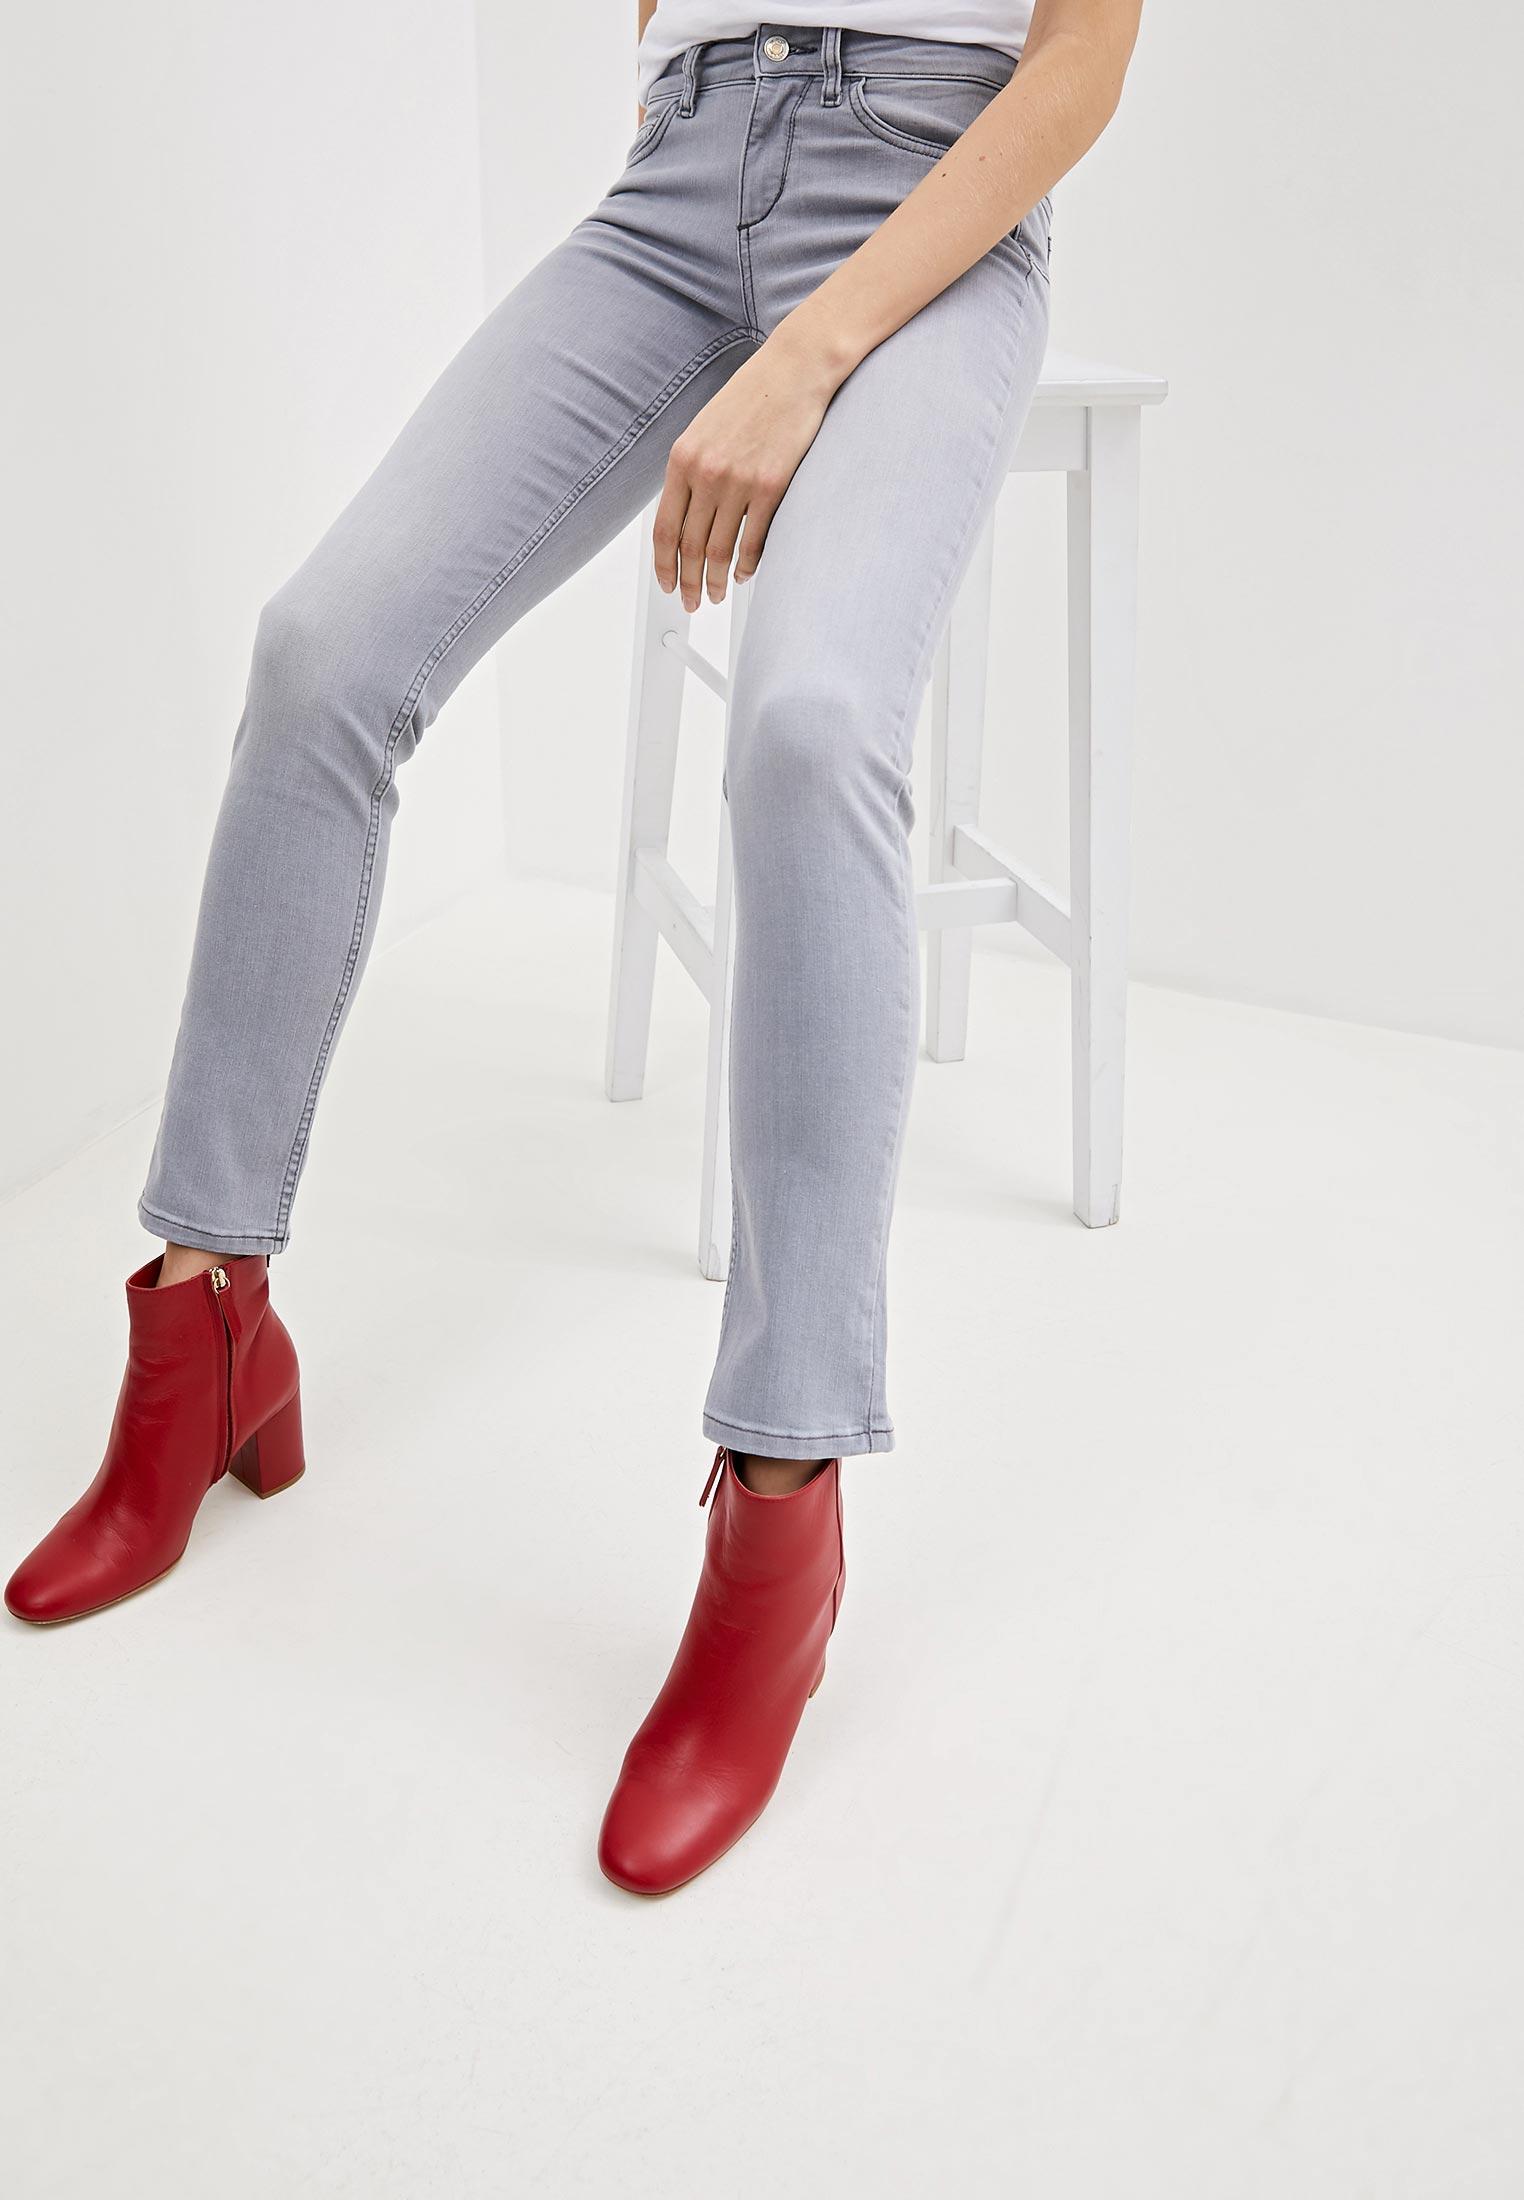 Tamaris pantaloni eleganti Denim jeans da donna in Used-Look Dimensione Breve Pantaloni di tendenza BLU